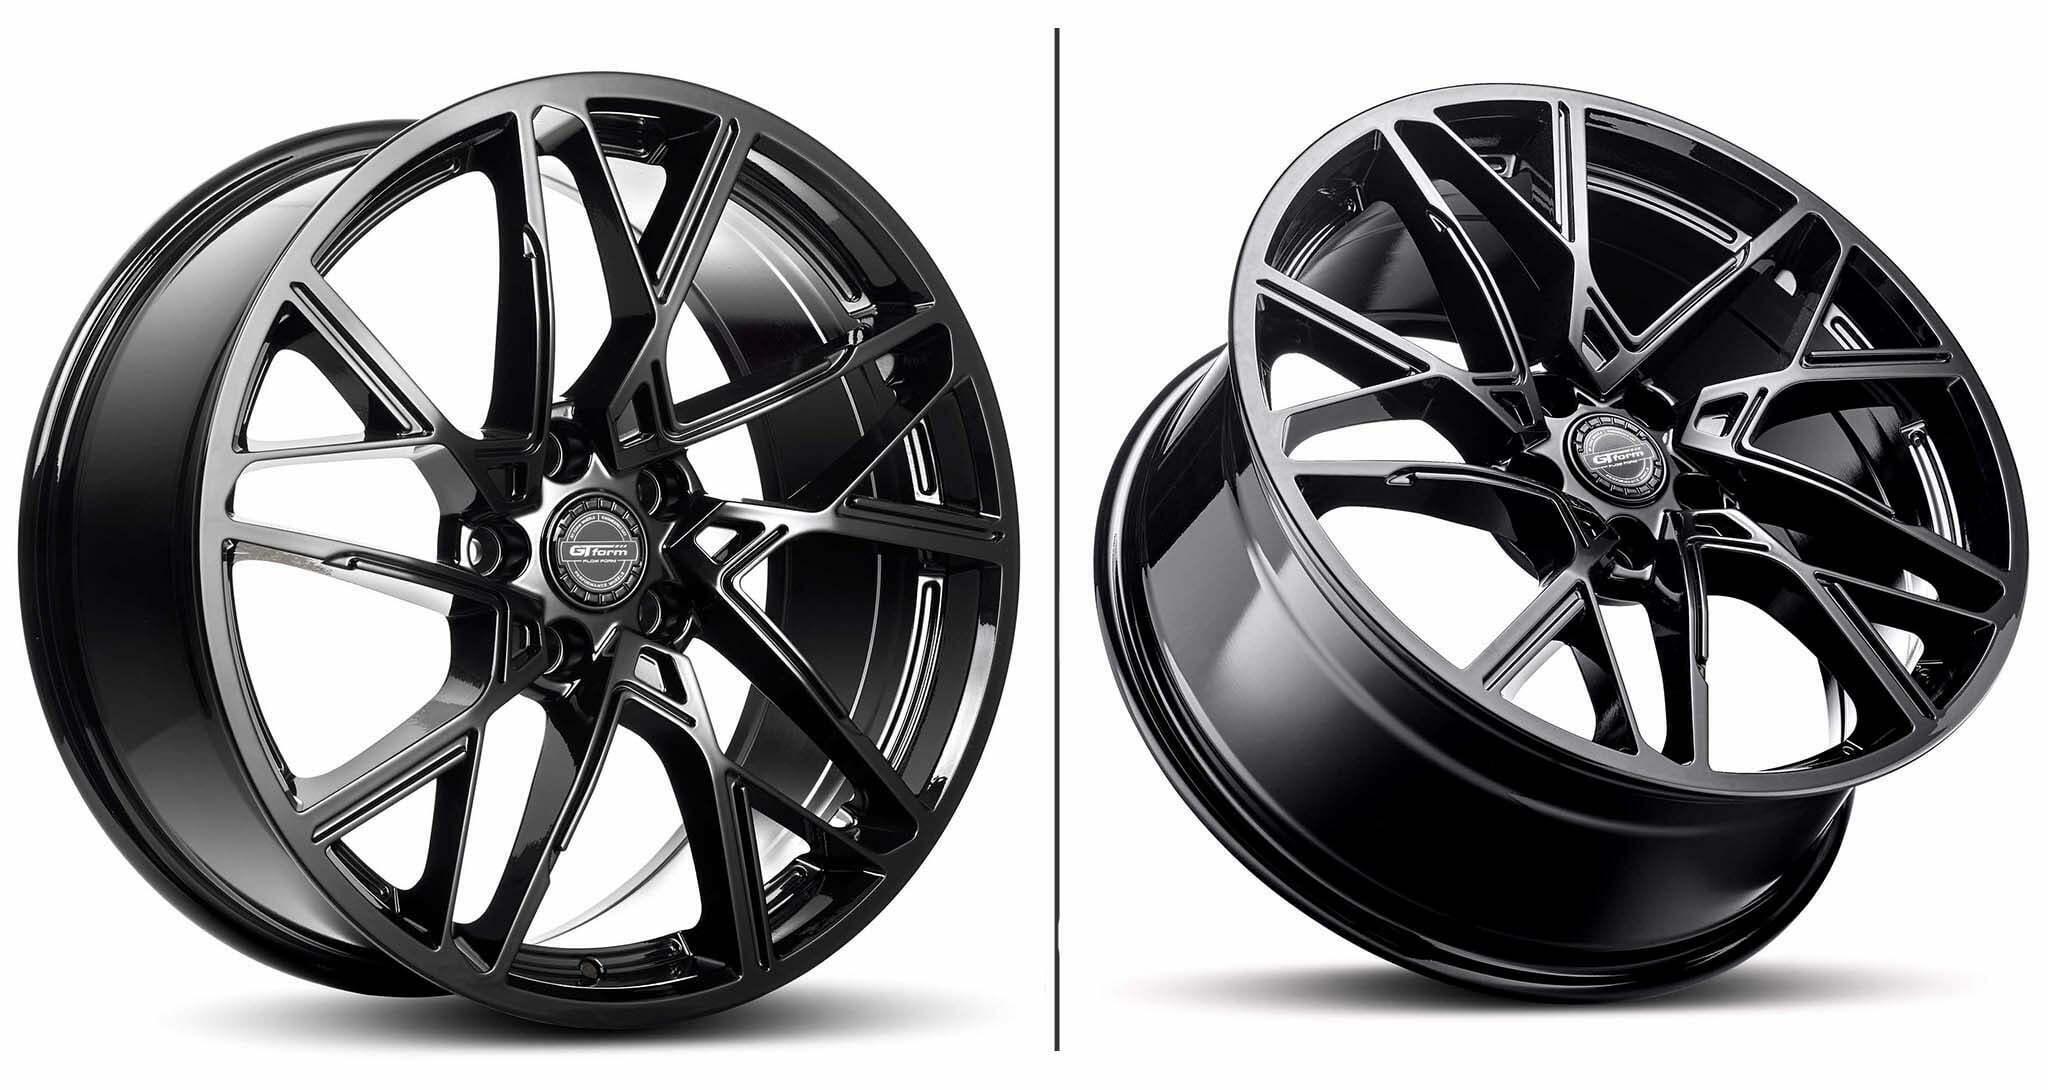 GT Form Interflow Gloss Black Wheel Performance Rims